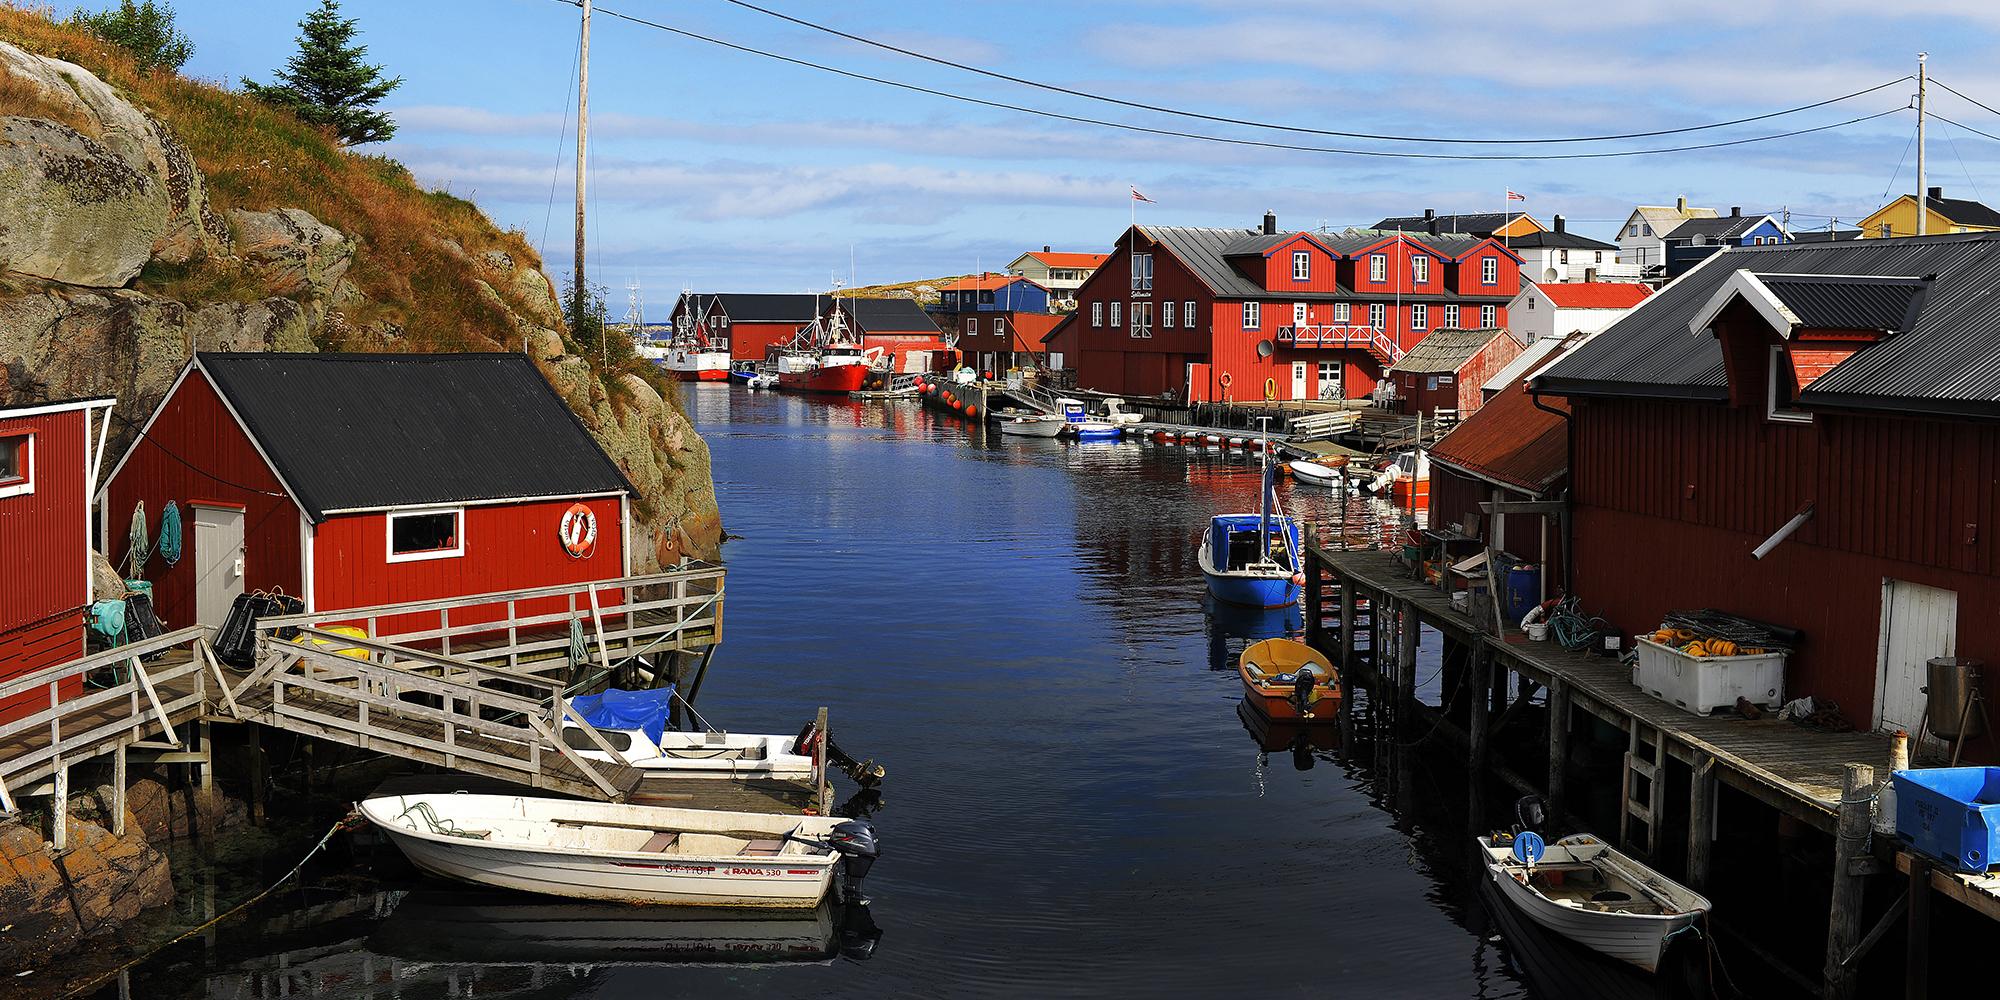 Hitra, Frøya and Fosen, Norway – Fishing village activities